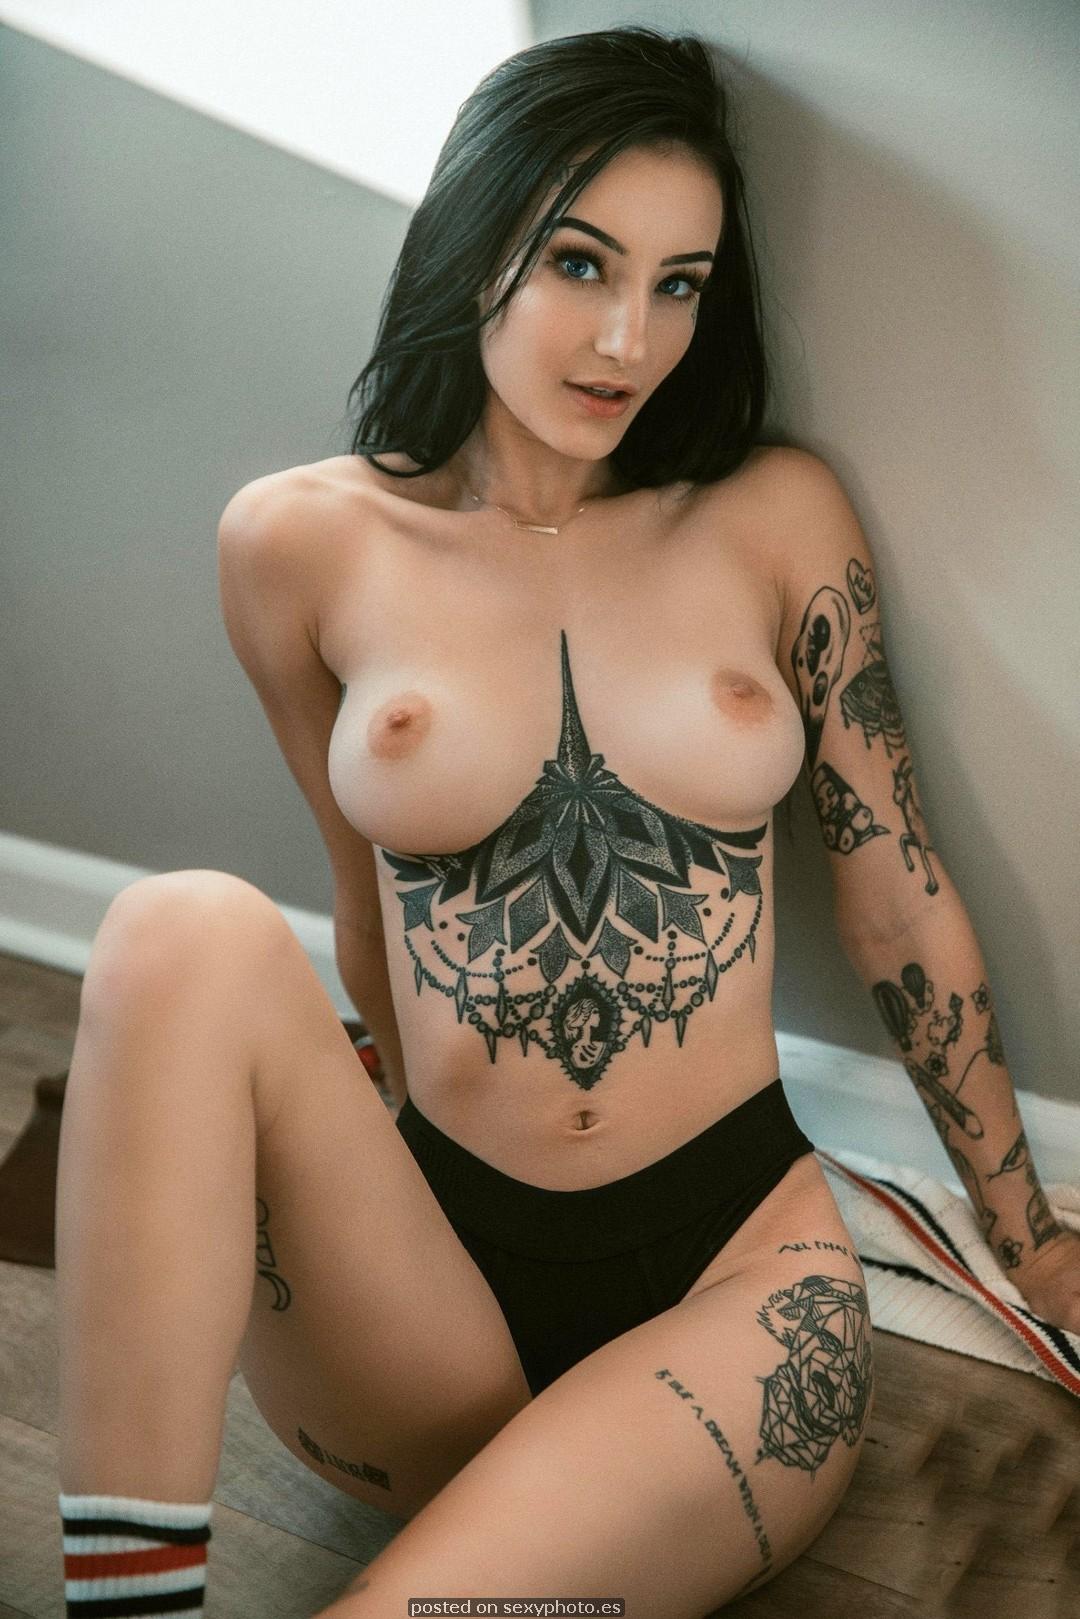 tias buenas, jovenes sexis, hot girls, sexy photo, fotos sexis, ass amateur, amateur boobs, perfect ass